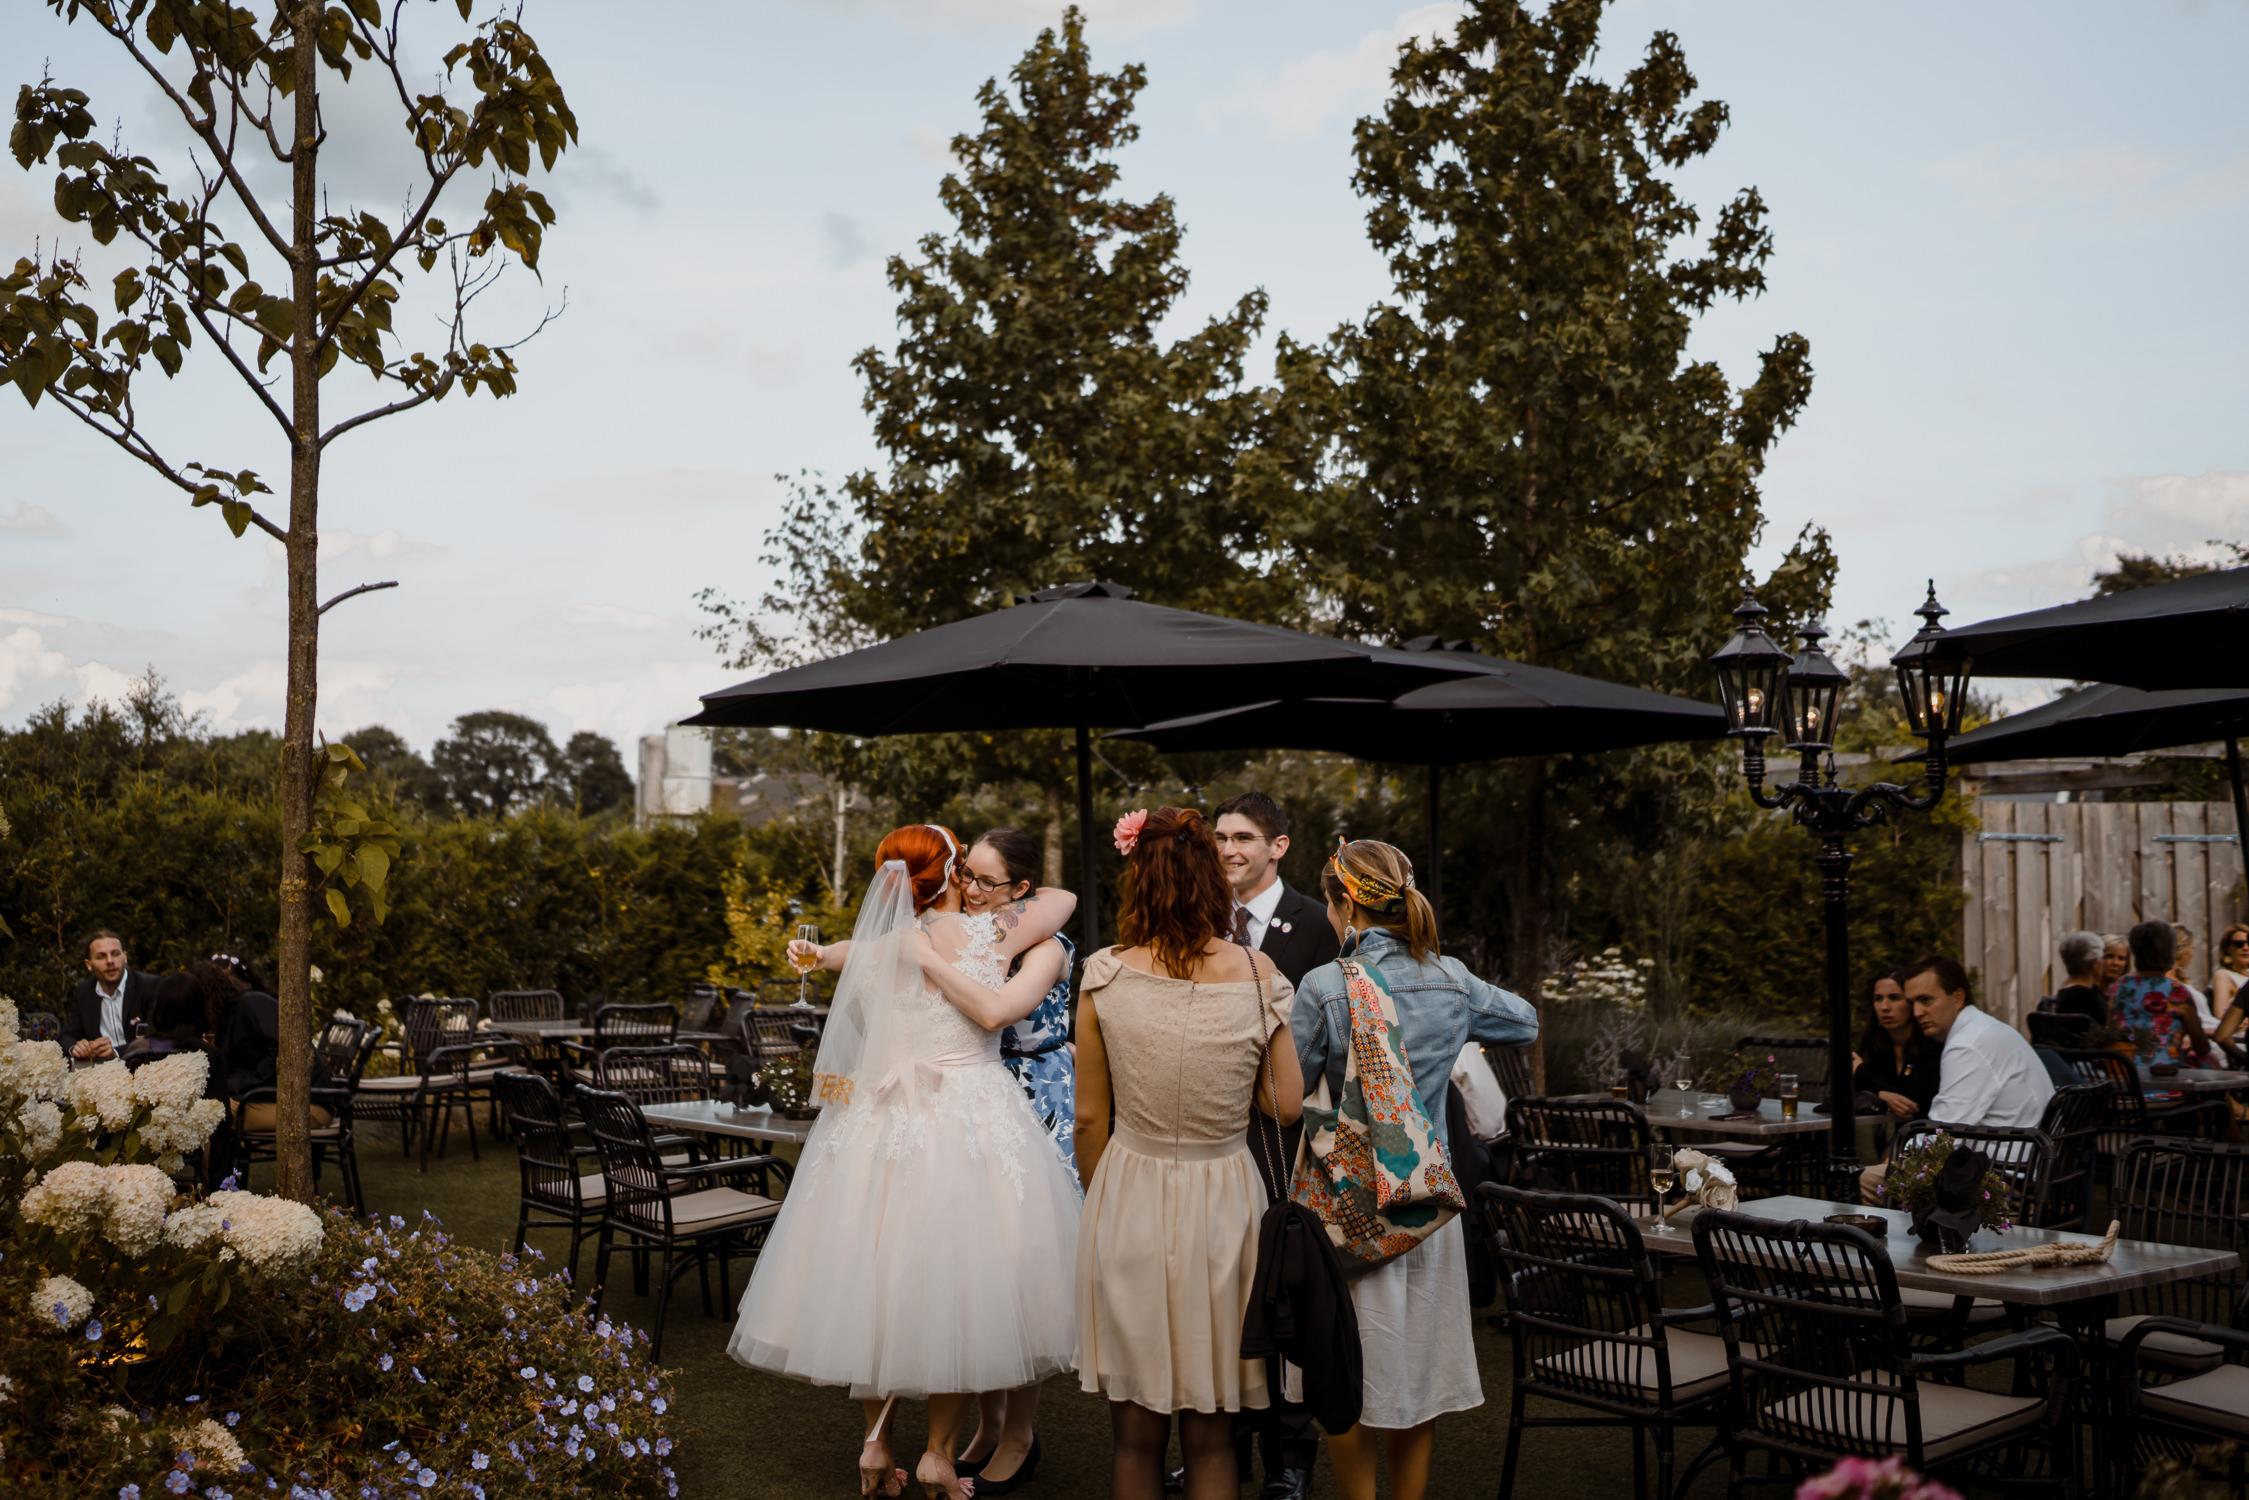 amsterdam-wedding-photographer-bruidsfotografie-trouwfotograaf-mark-hadden-Lucie-Luuk-239.jpg